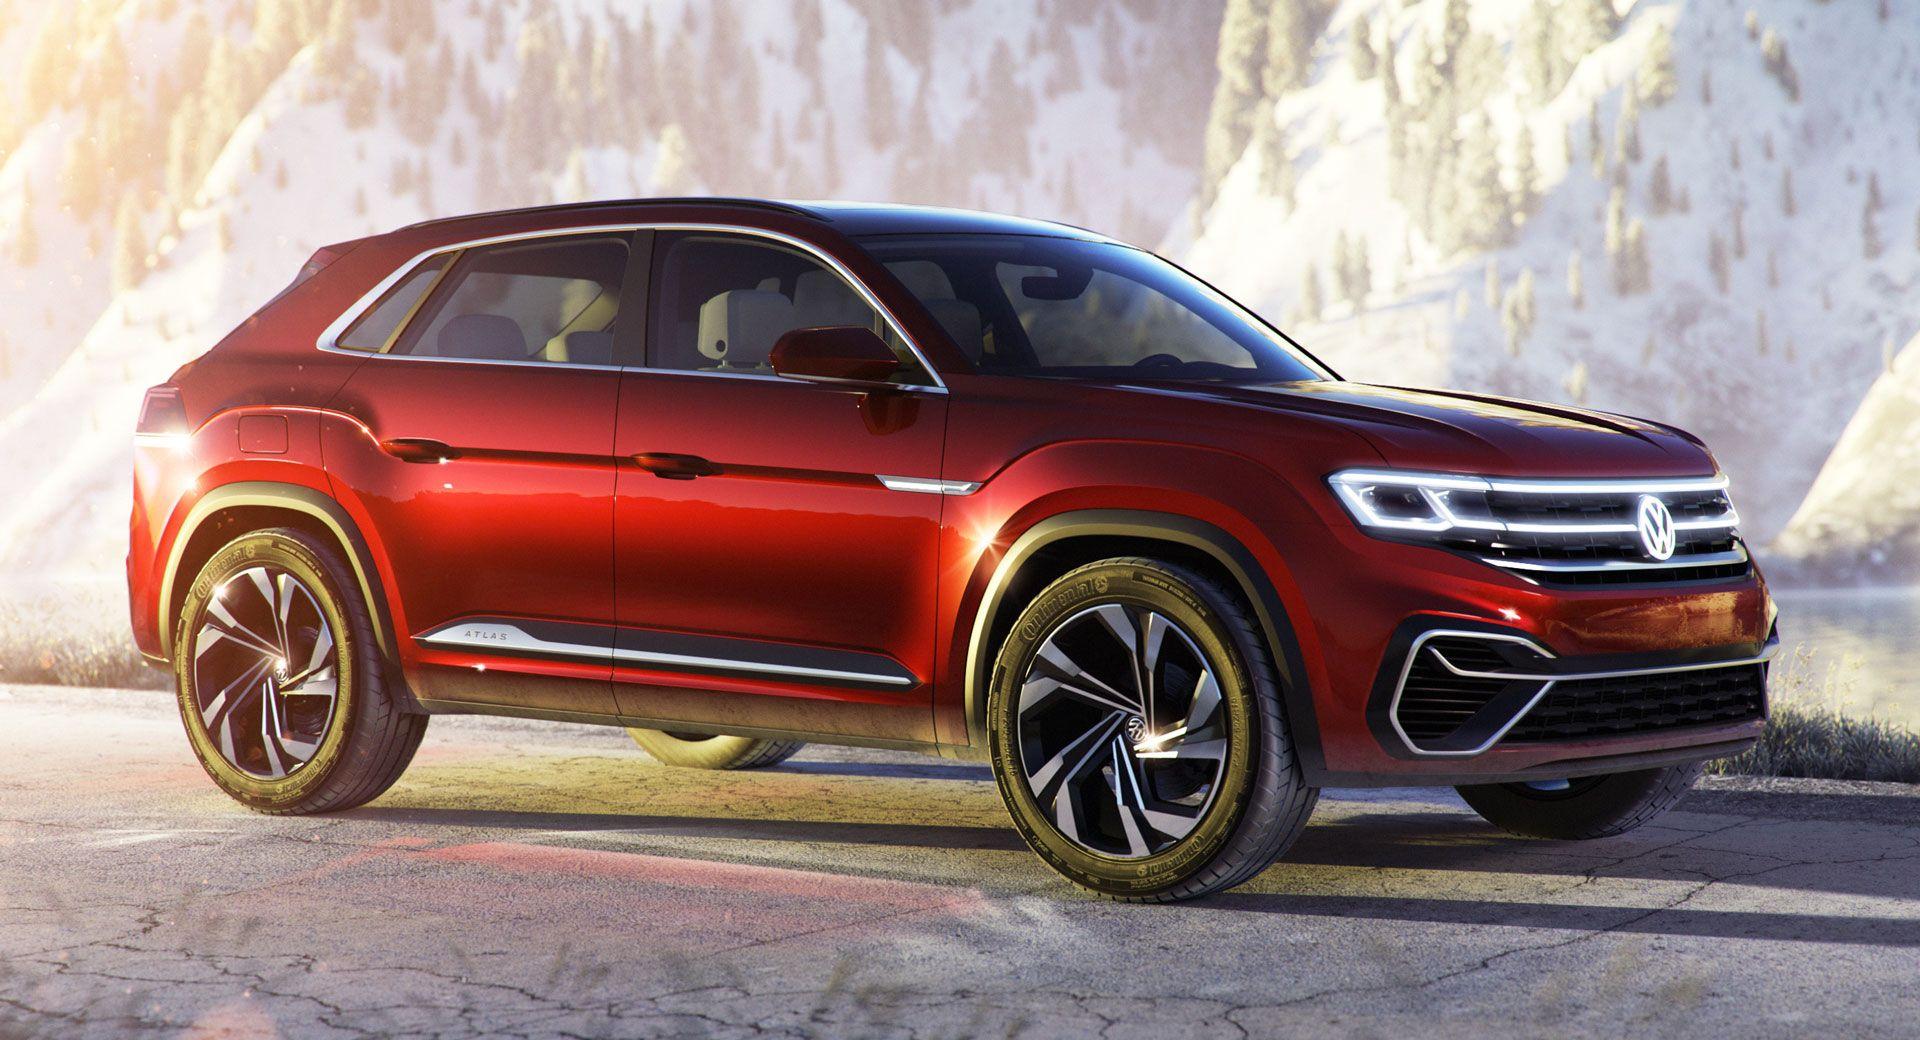 VW Atlas Cross Sport Concept Is The People's BMW X6